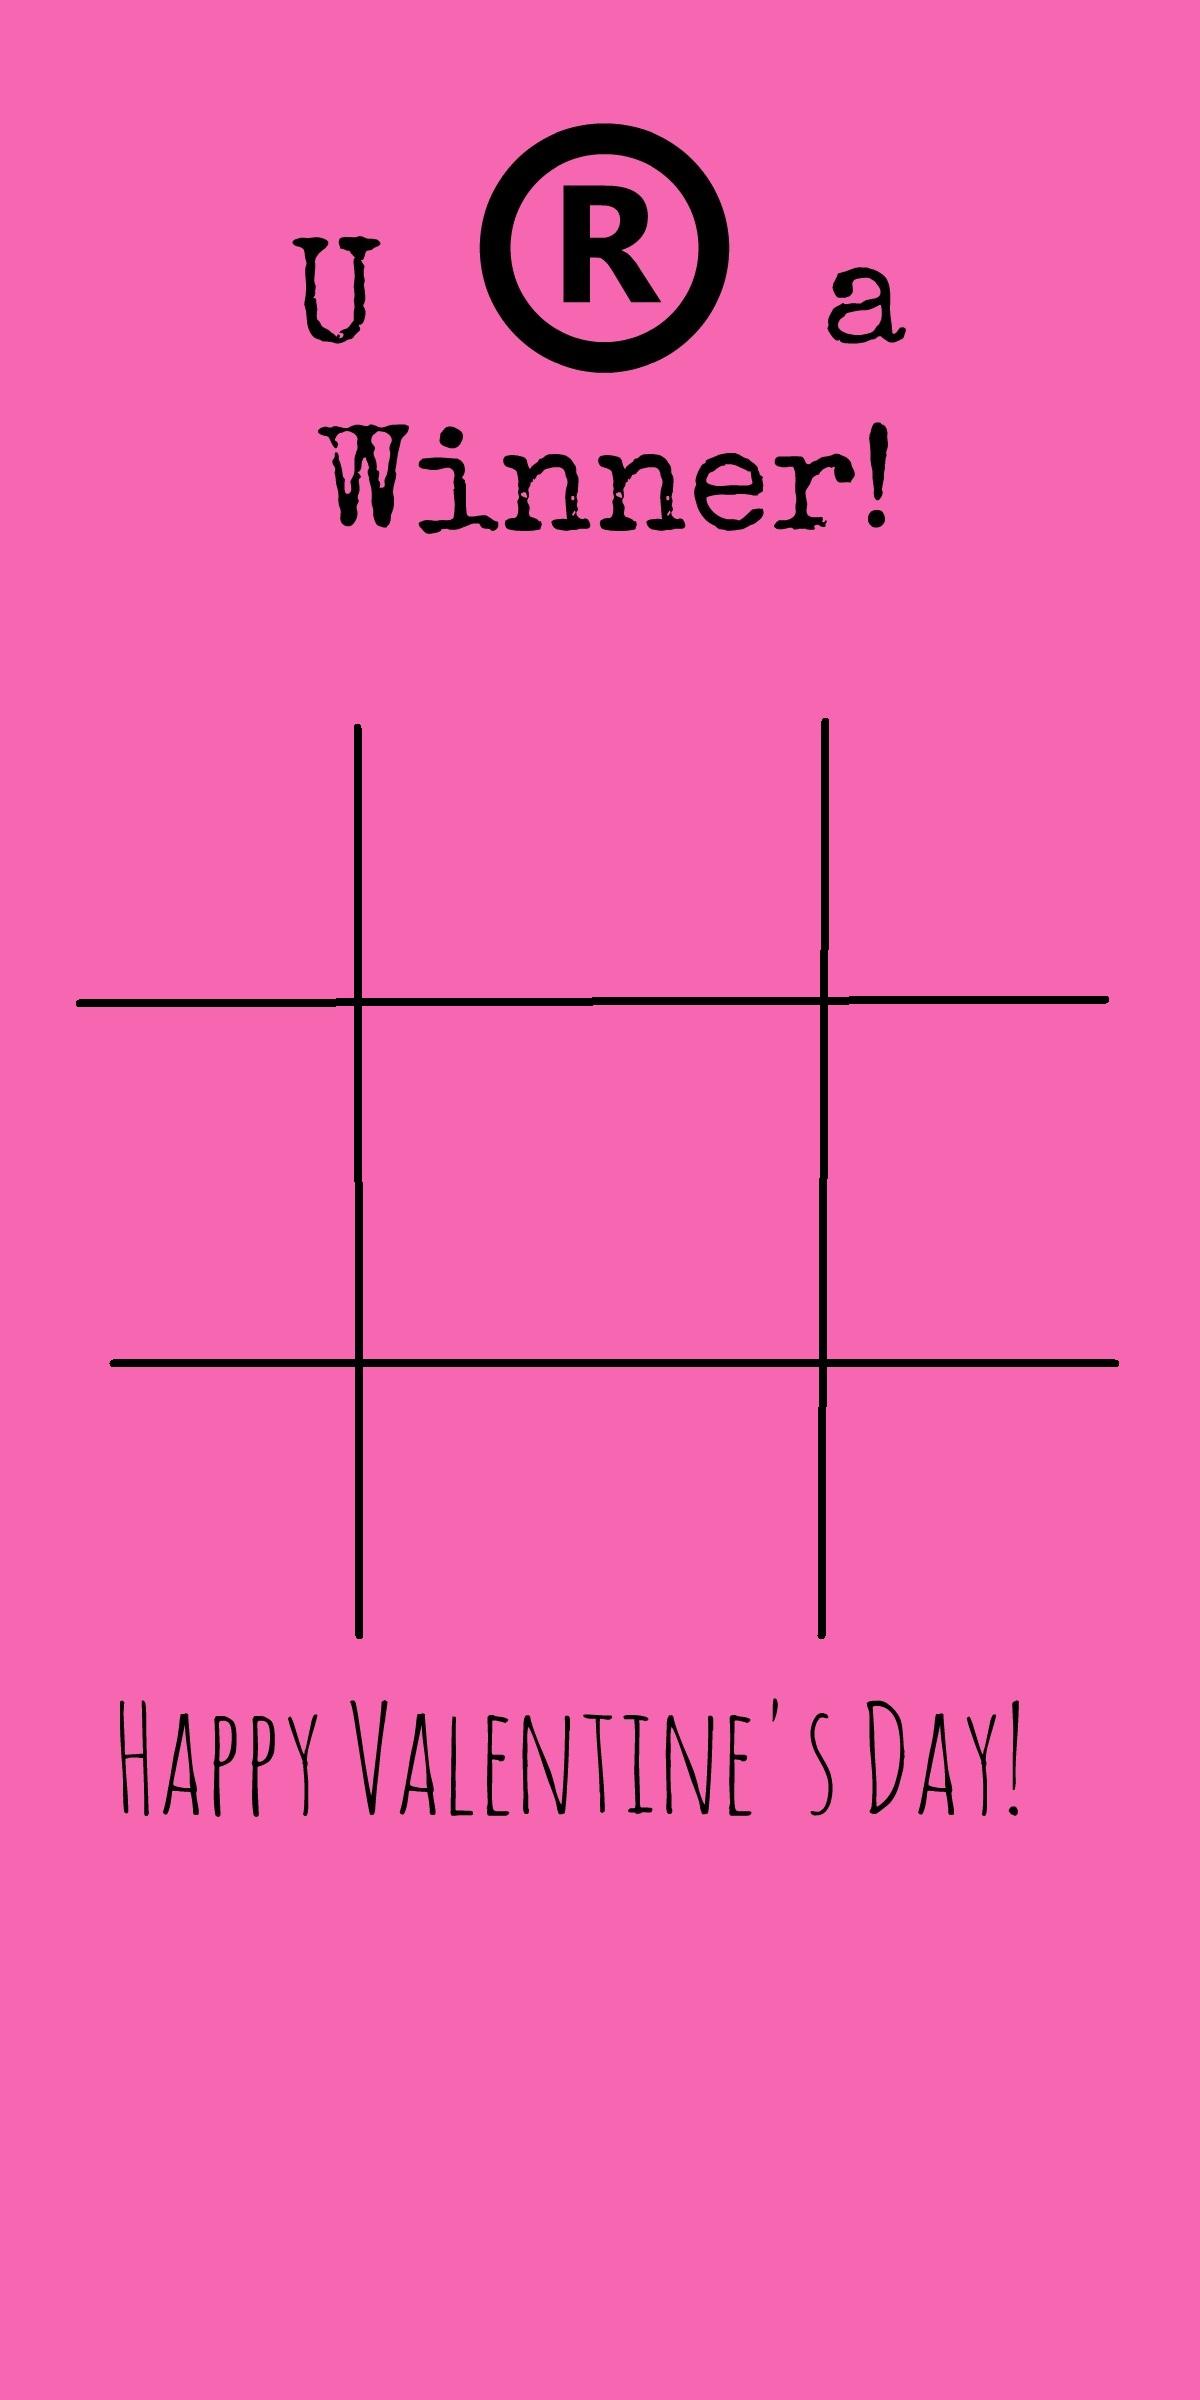 Tic Tac Toe Game Board Valentines Day Card Idea  BargainBriana